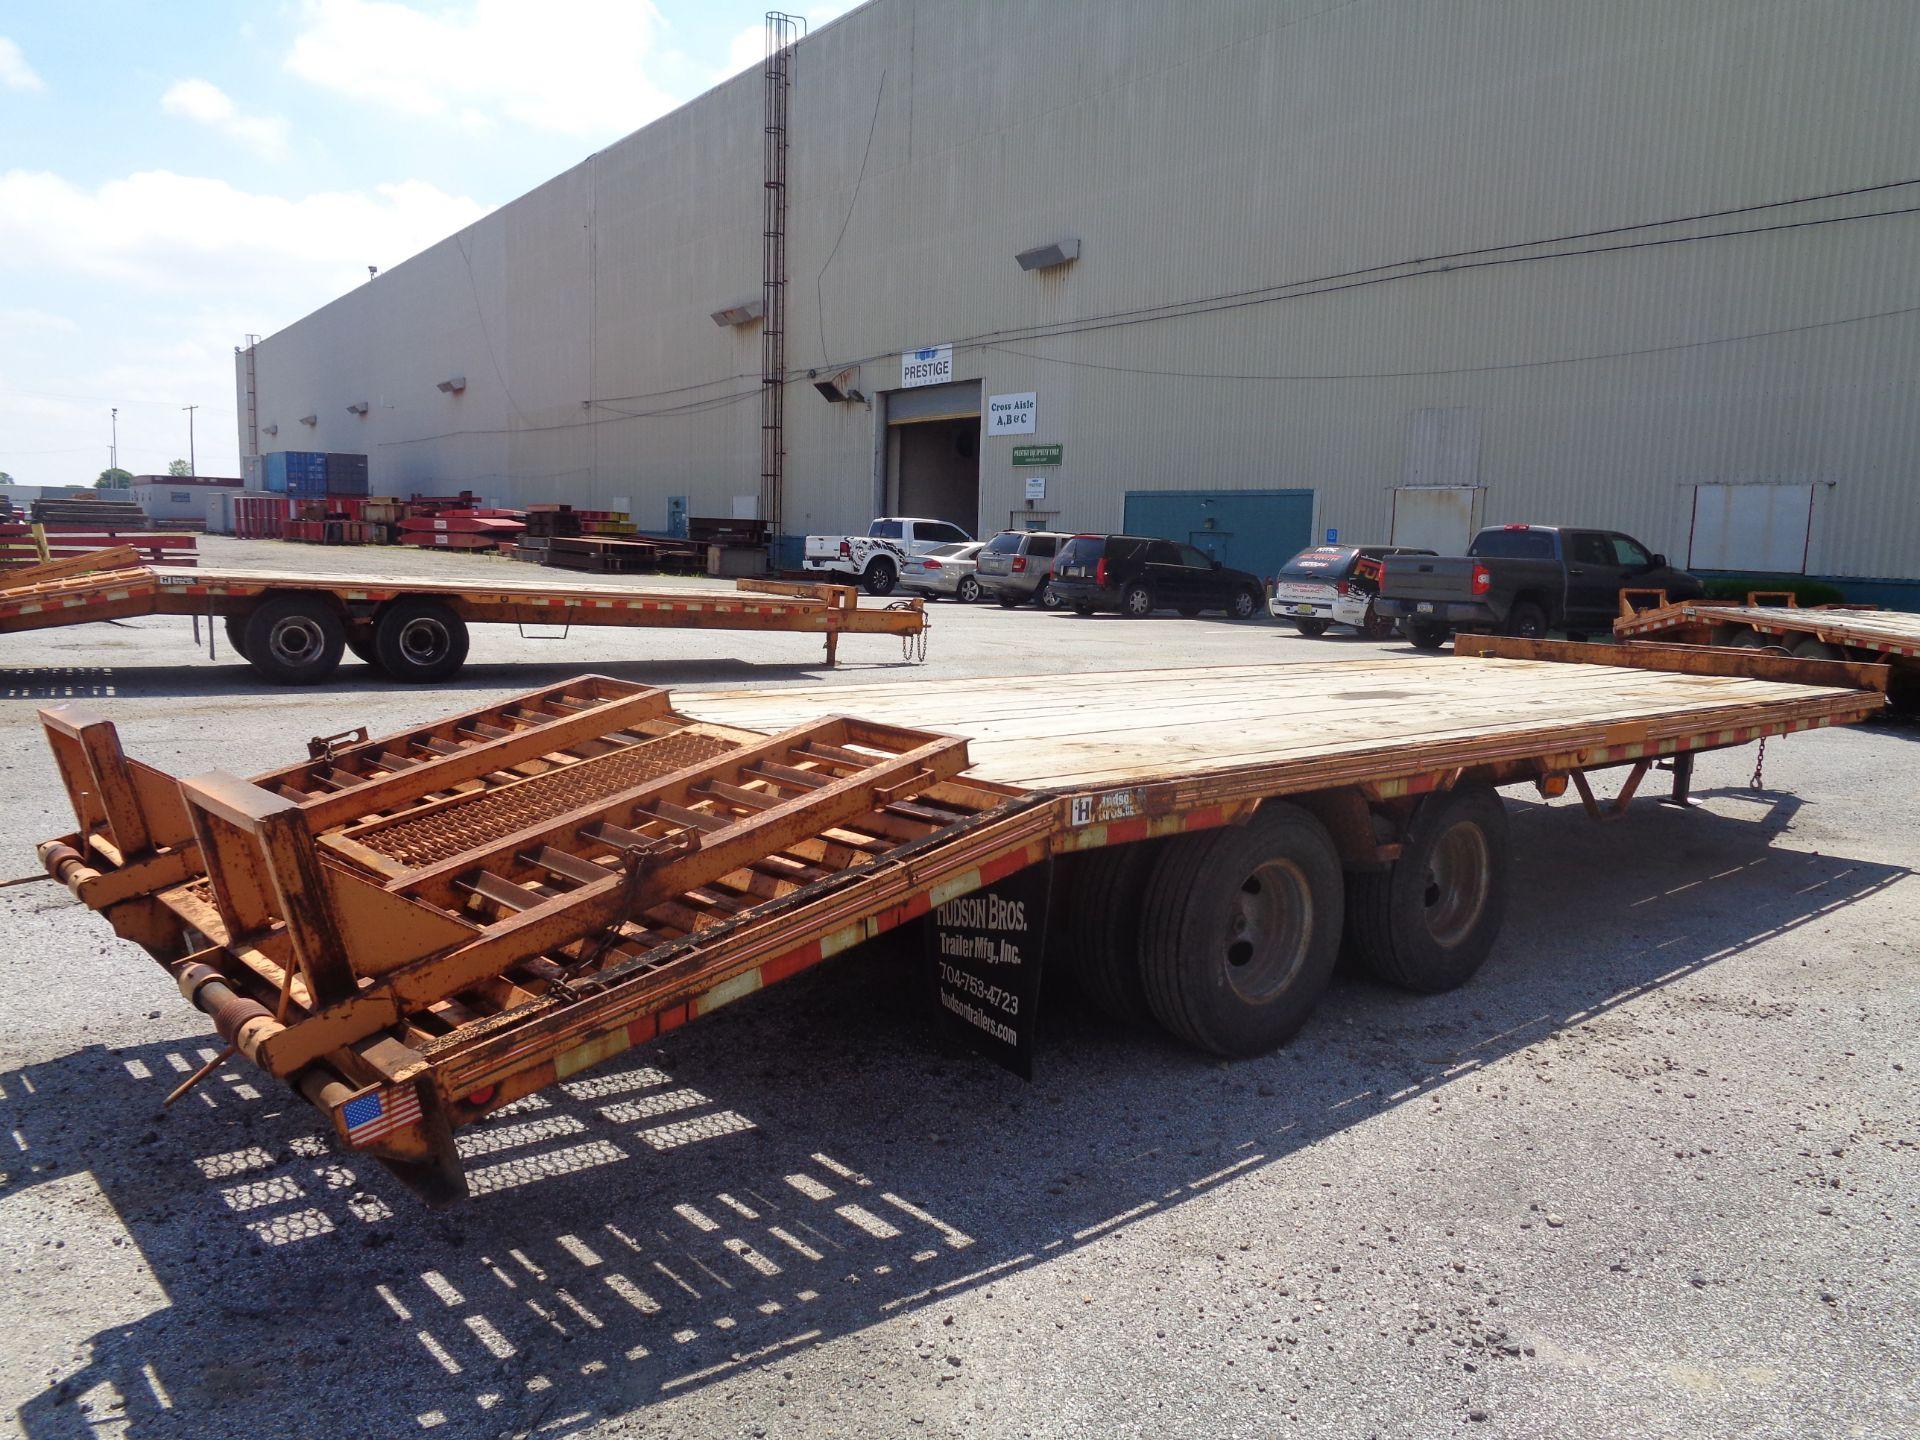 Lot 15 - 2009 Hudson Bros Trailer HTD18D- 10 Ton- 20FT Equipment Flat Bed